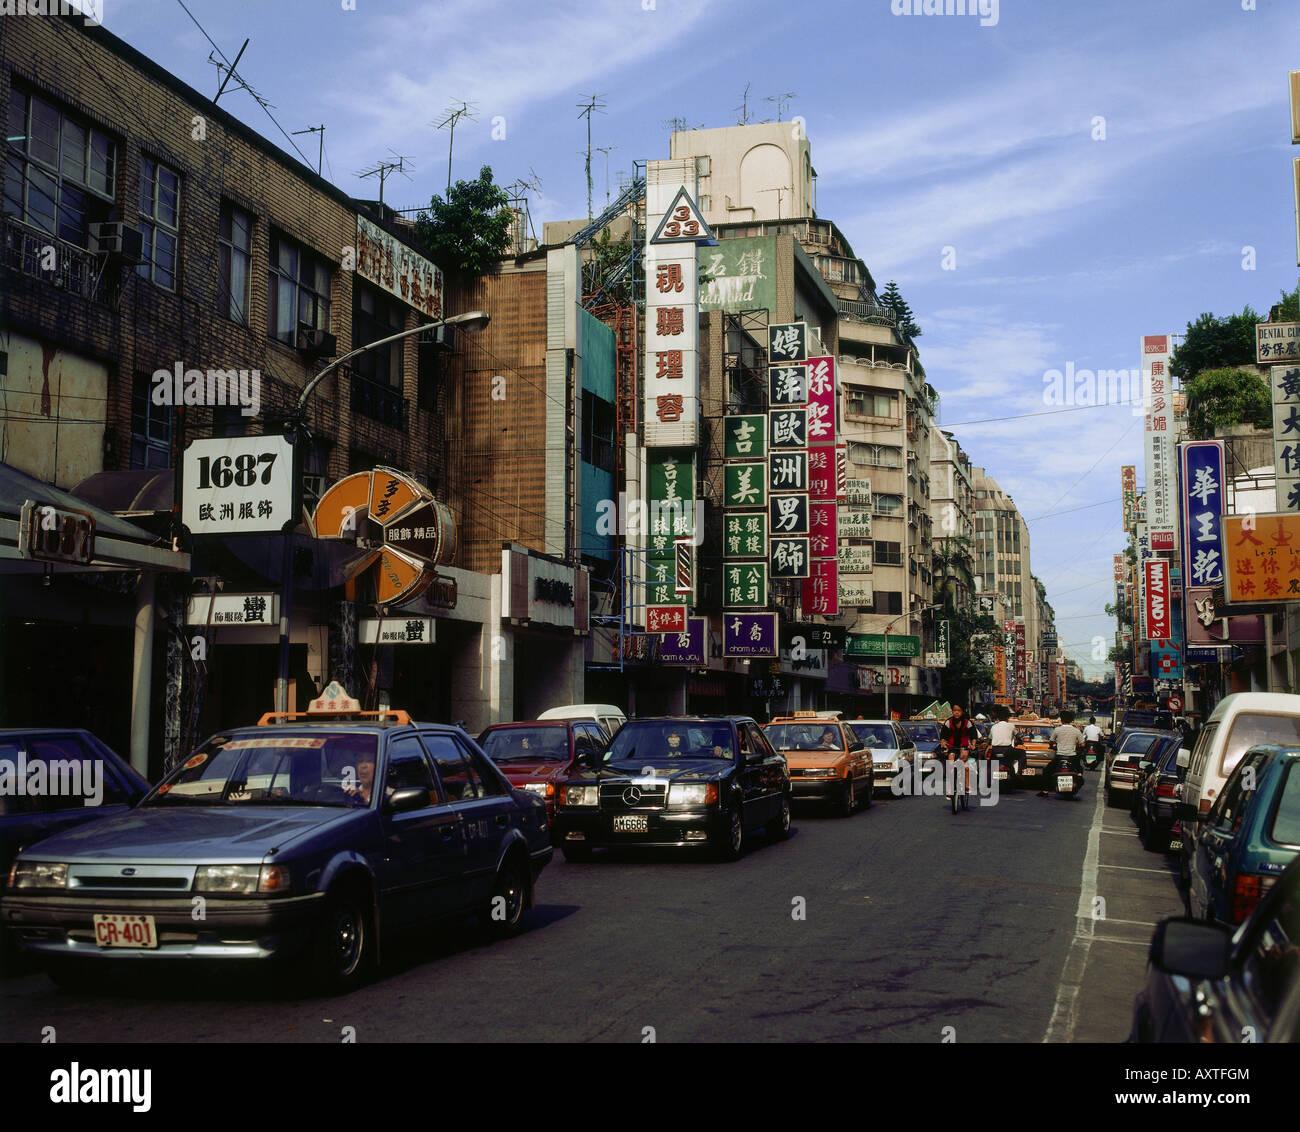 geography / travel, Taiwan, Taipeh, Street Scenes, Taipei, capital, traffic, traffic jam, advertisement - Stock Image